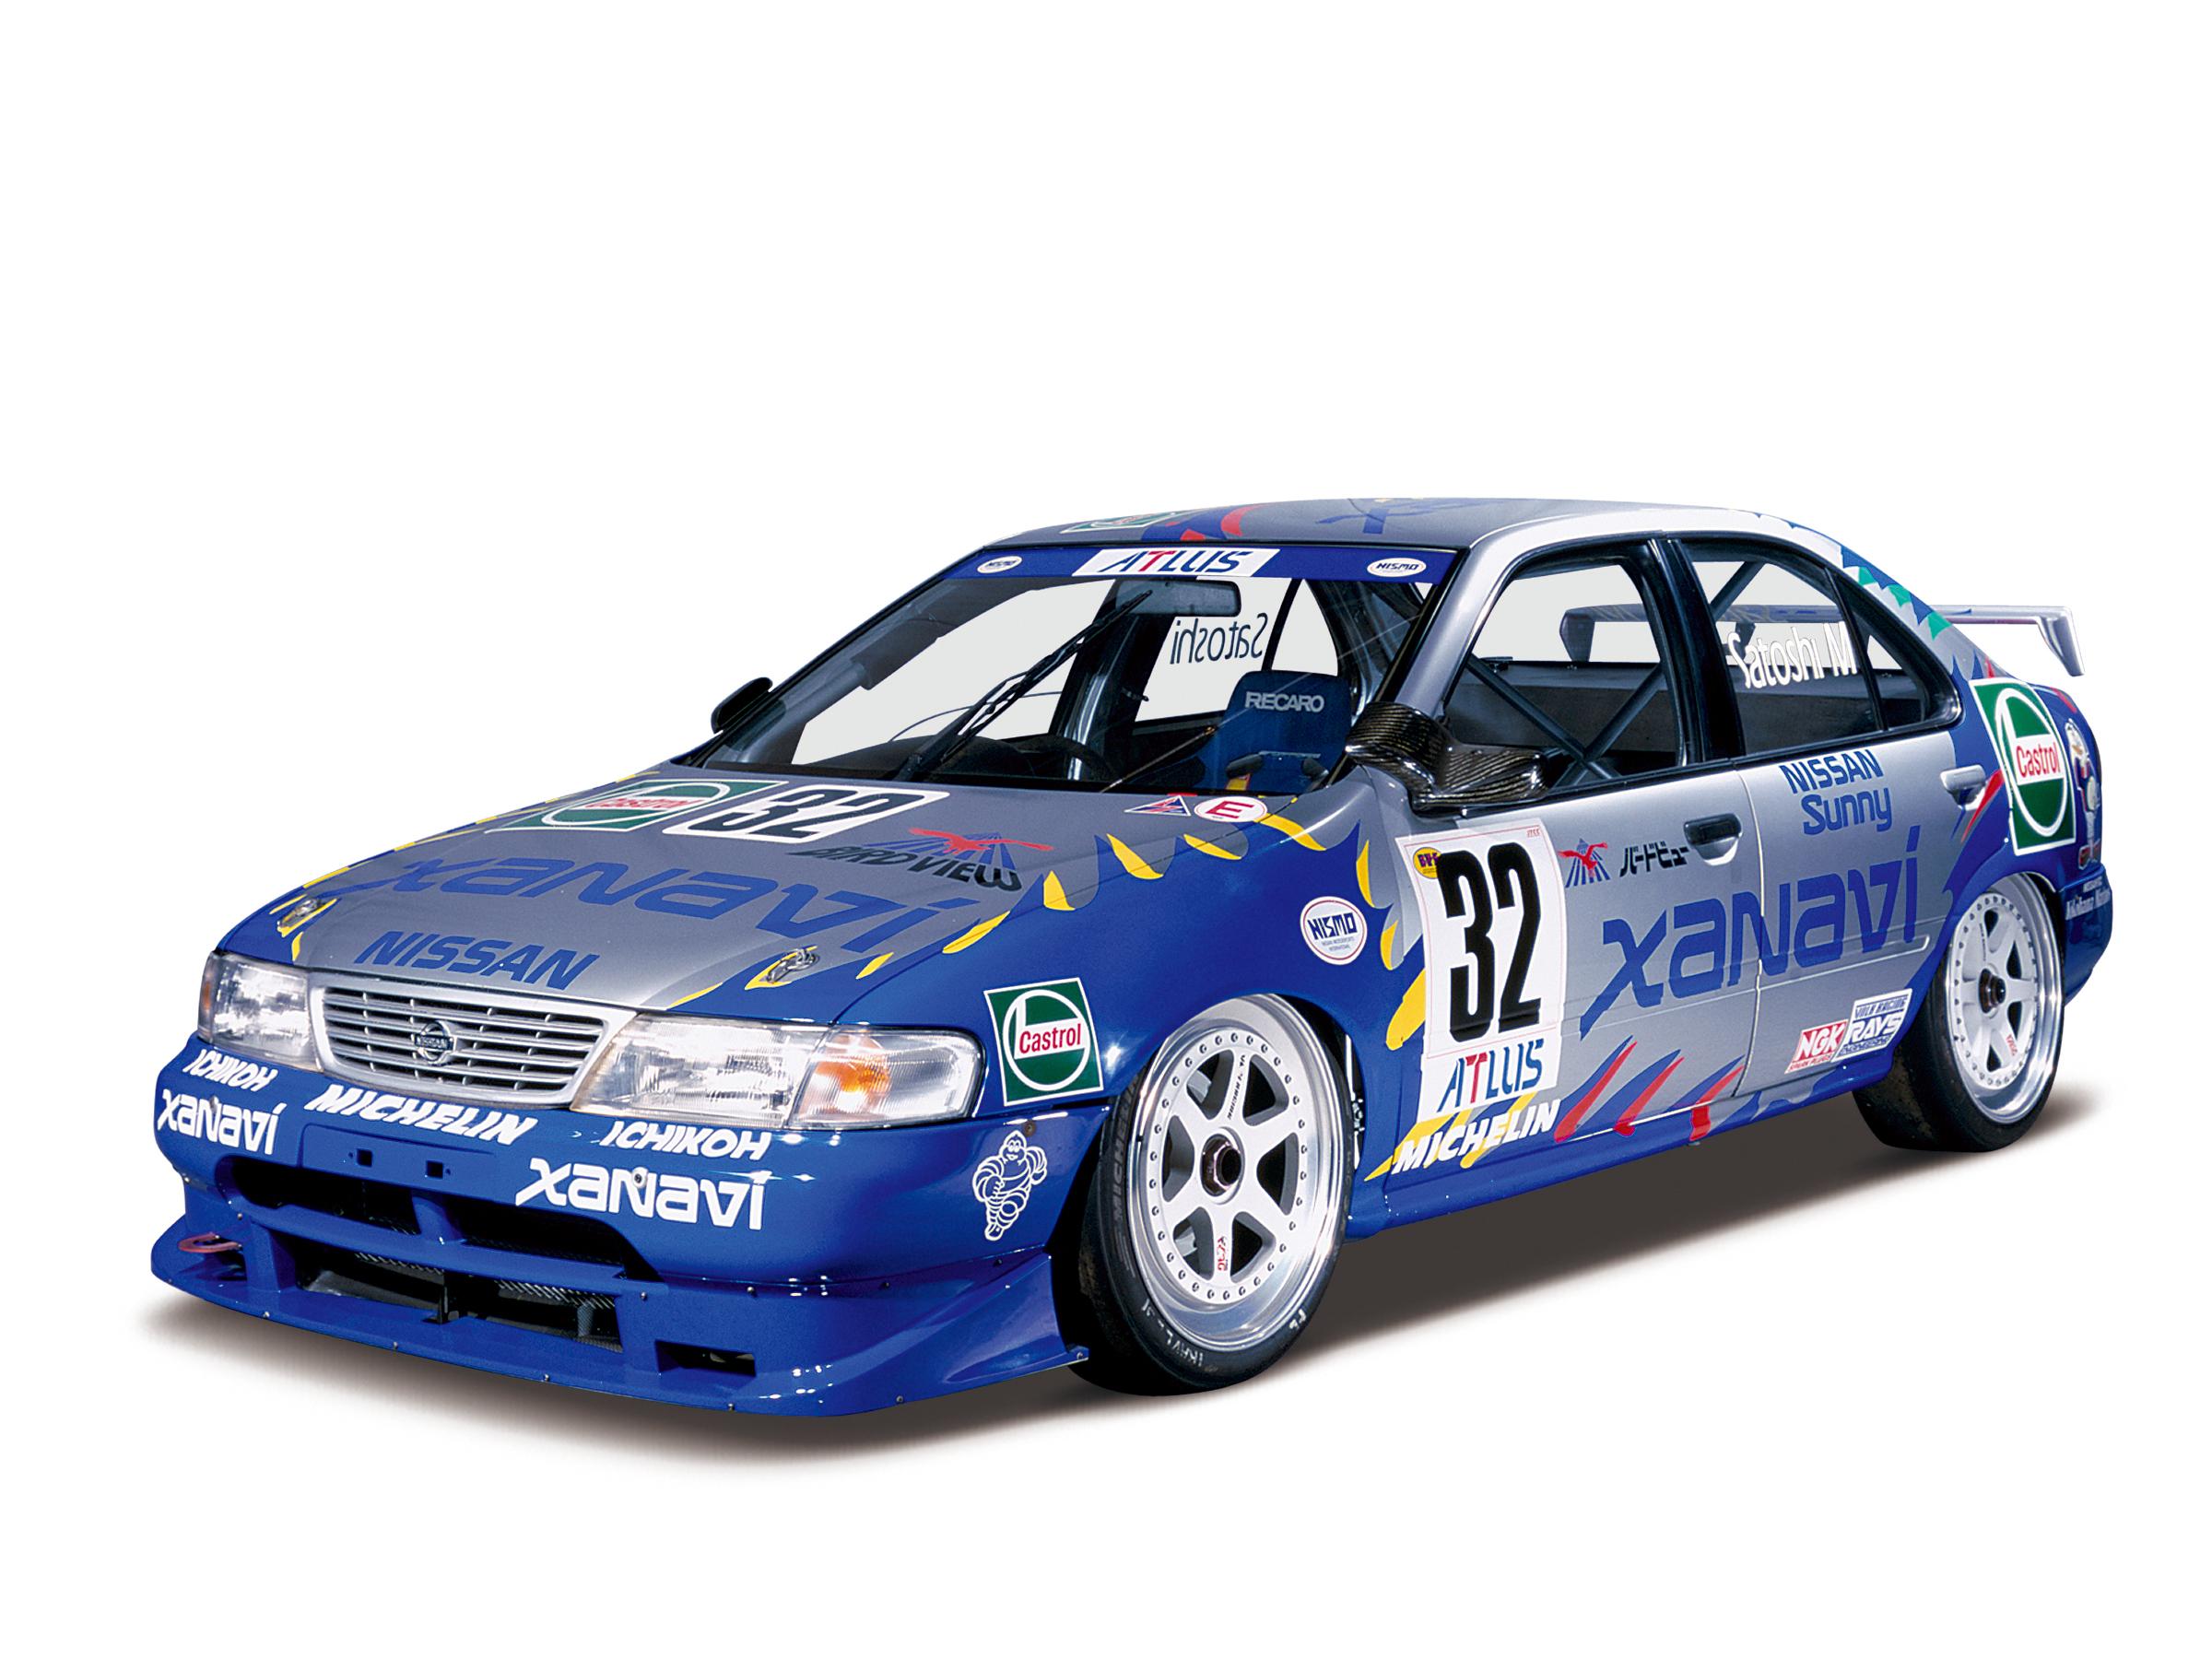 O also Fb D B Eabd Bc Edd Abaf Matt Retro Cars moreover Hpsr additionally A F F F Ded D E Nice also . on btcc nissan primera